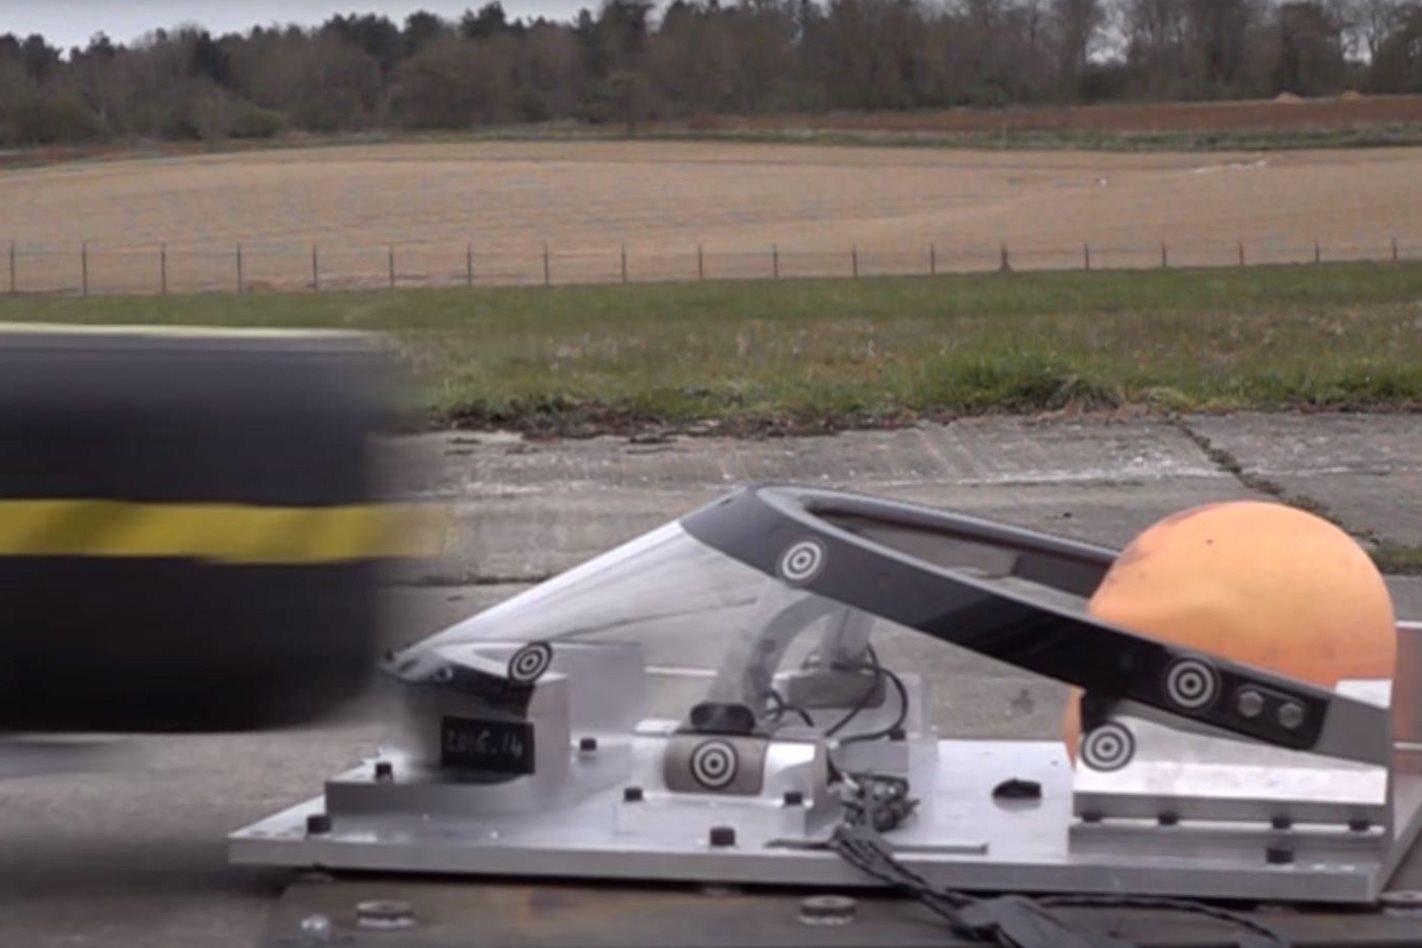 The Halo F1 testing